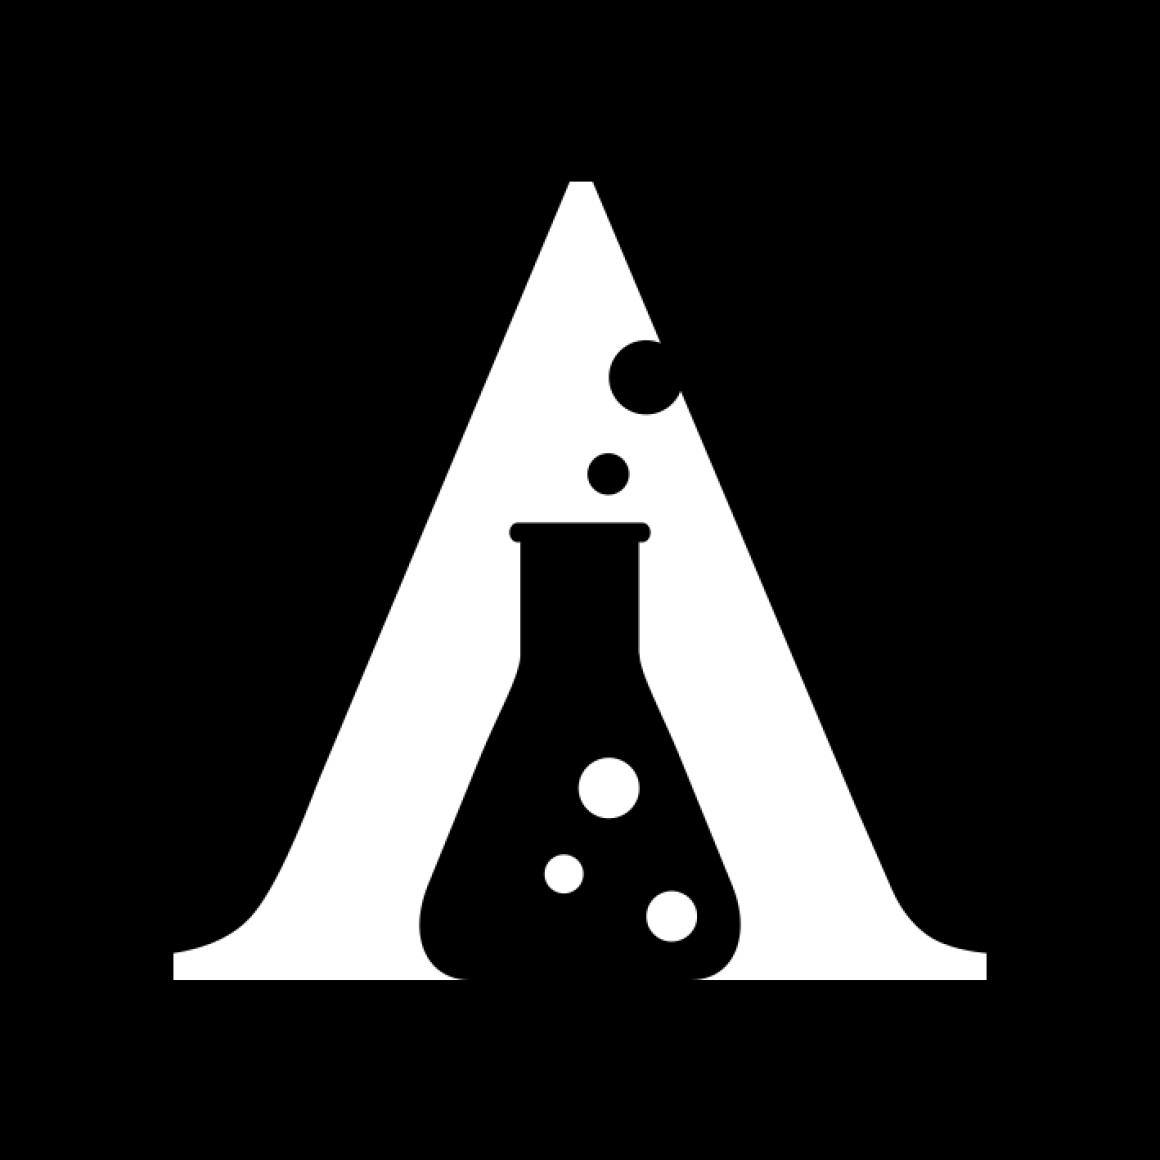 alchemist-icon-1160x1160